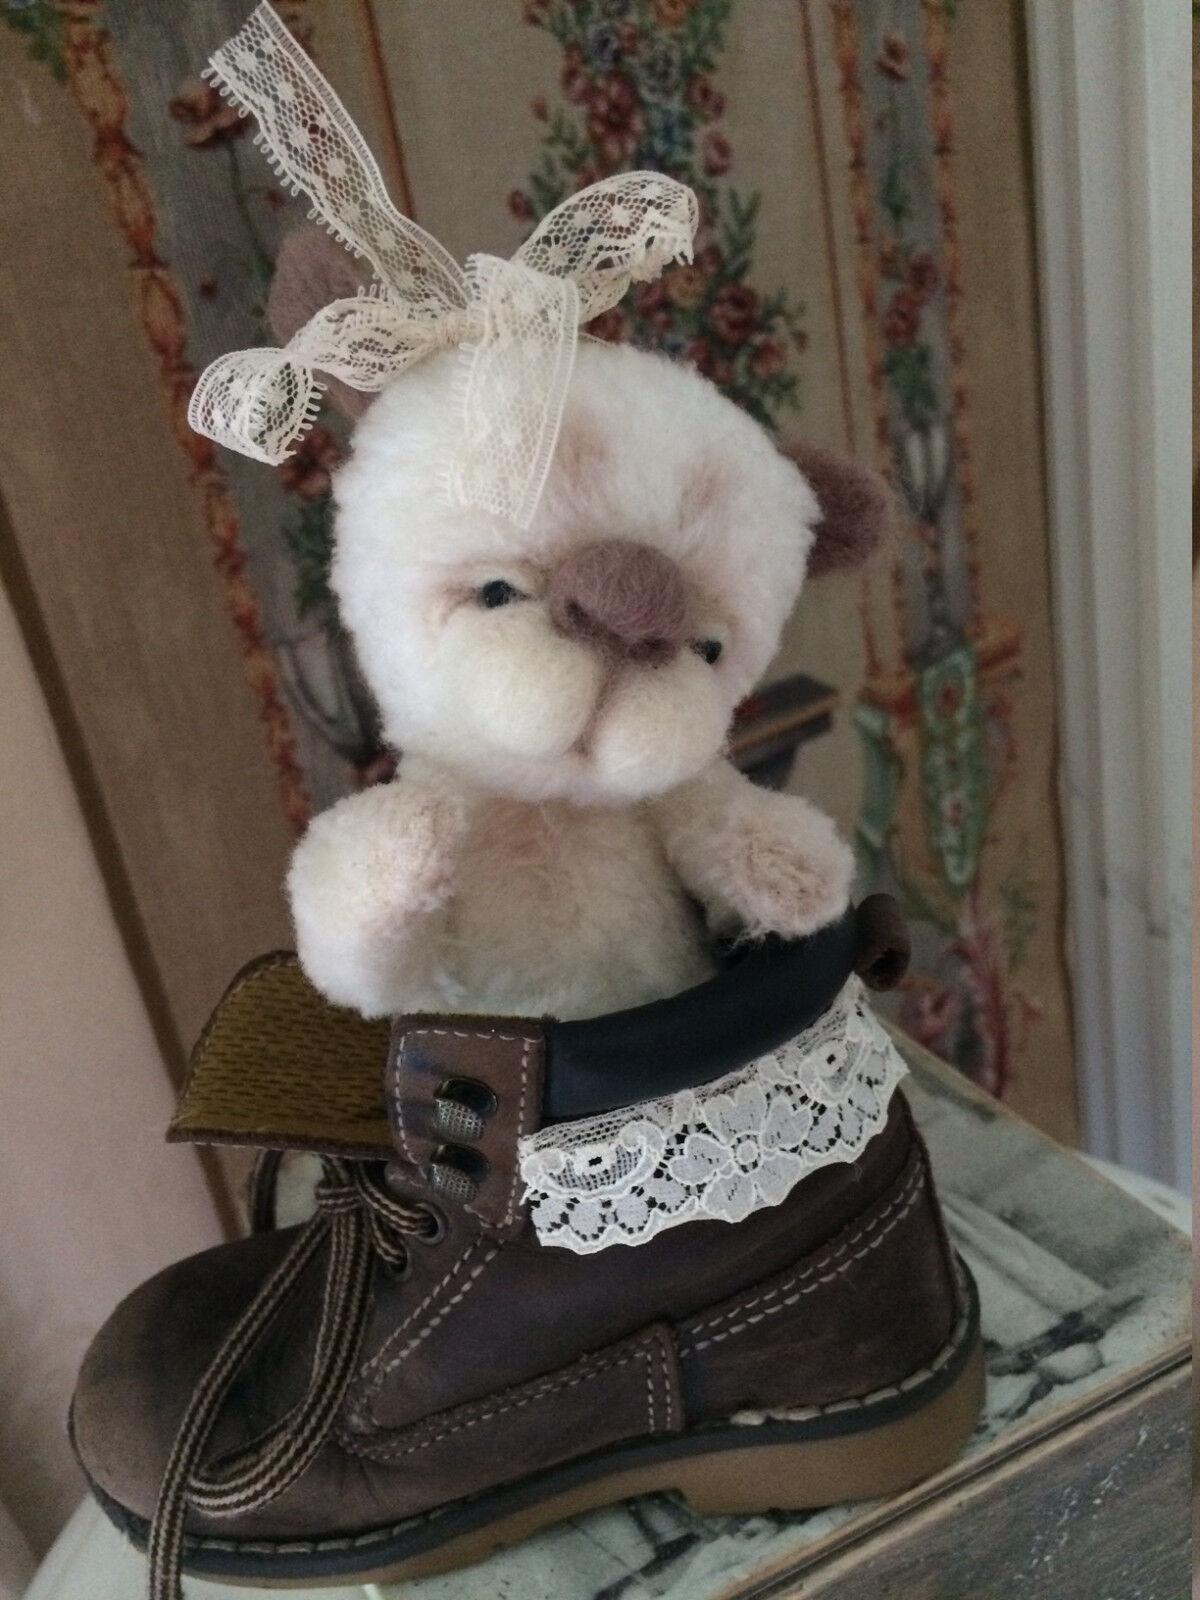 OOAK Teddy  Dog in the scarpe vintage style